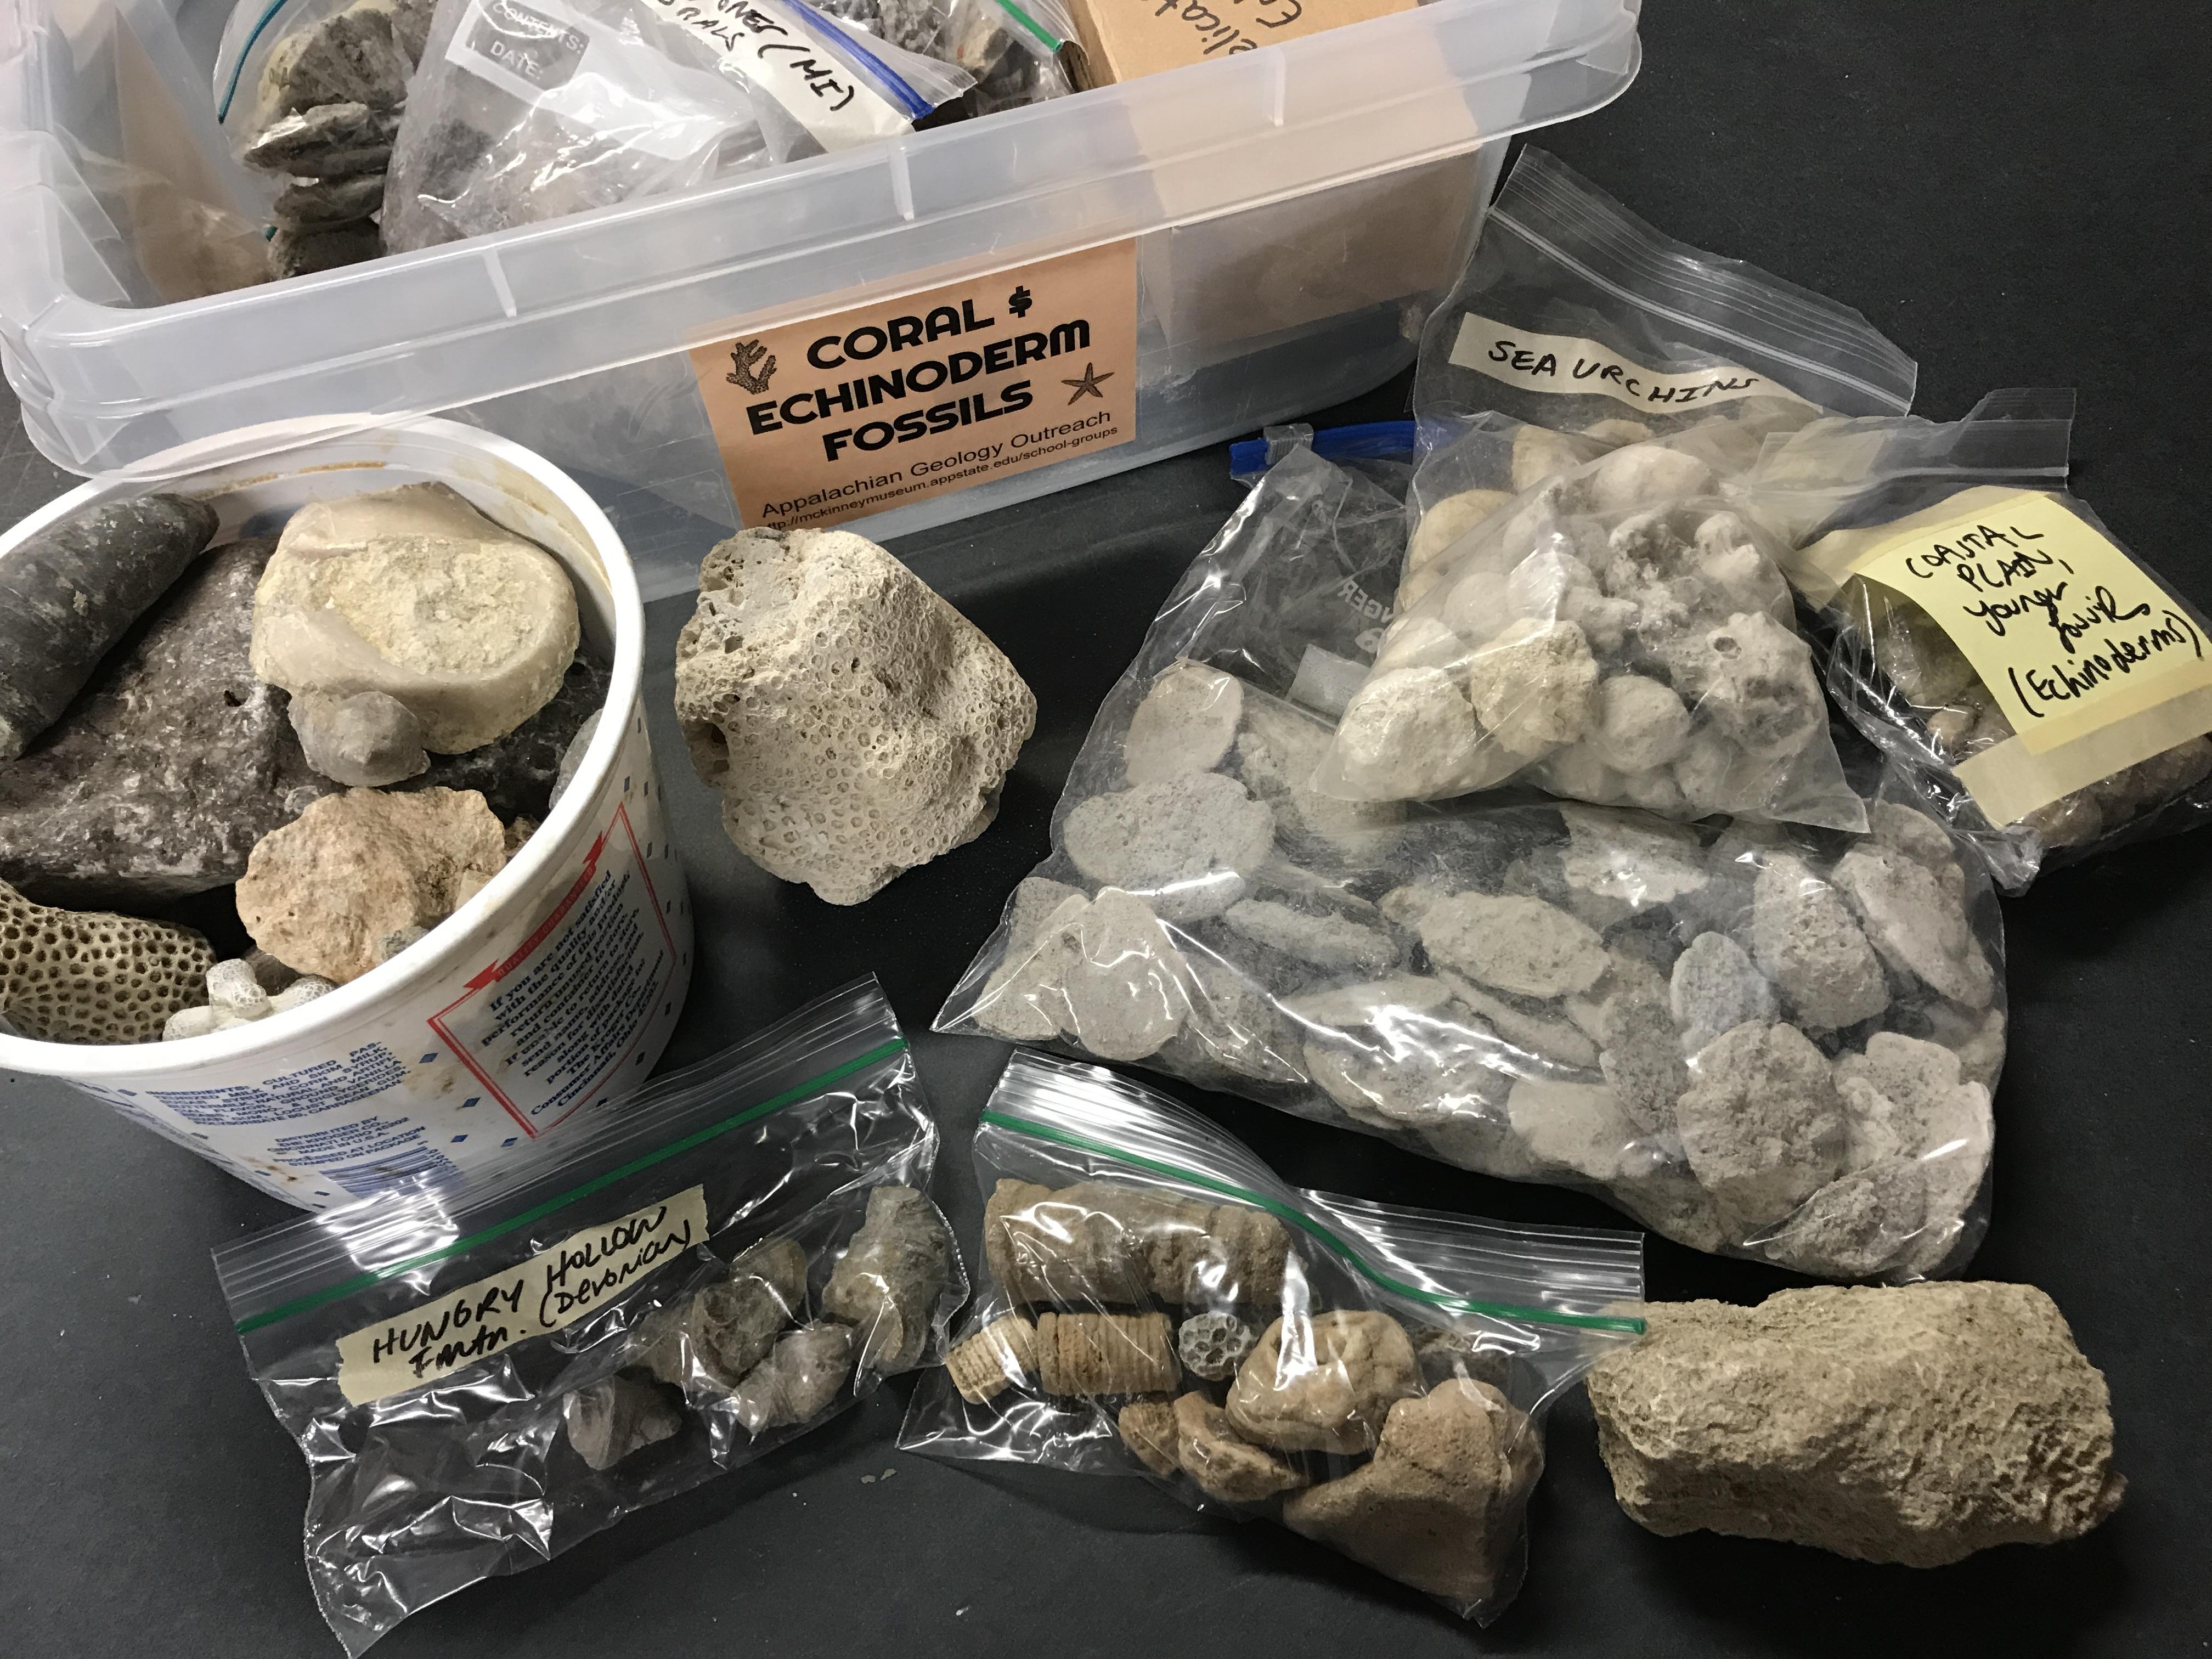 Echinoderm & Coral Fossils